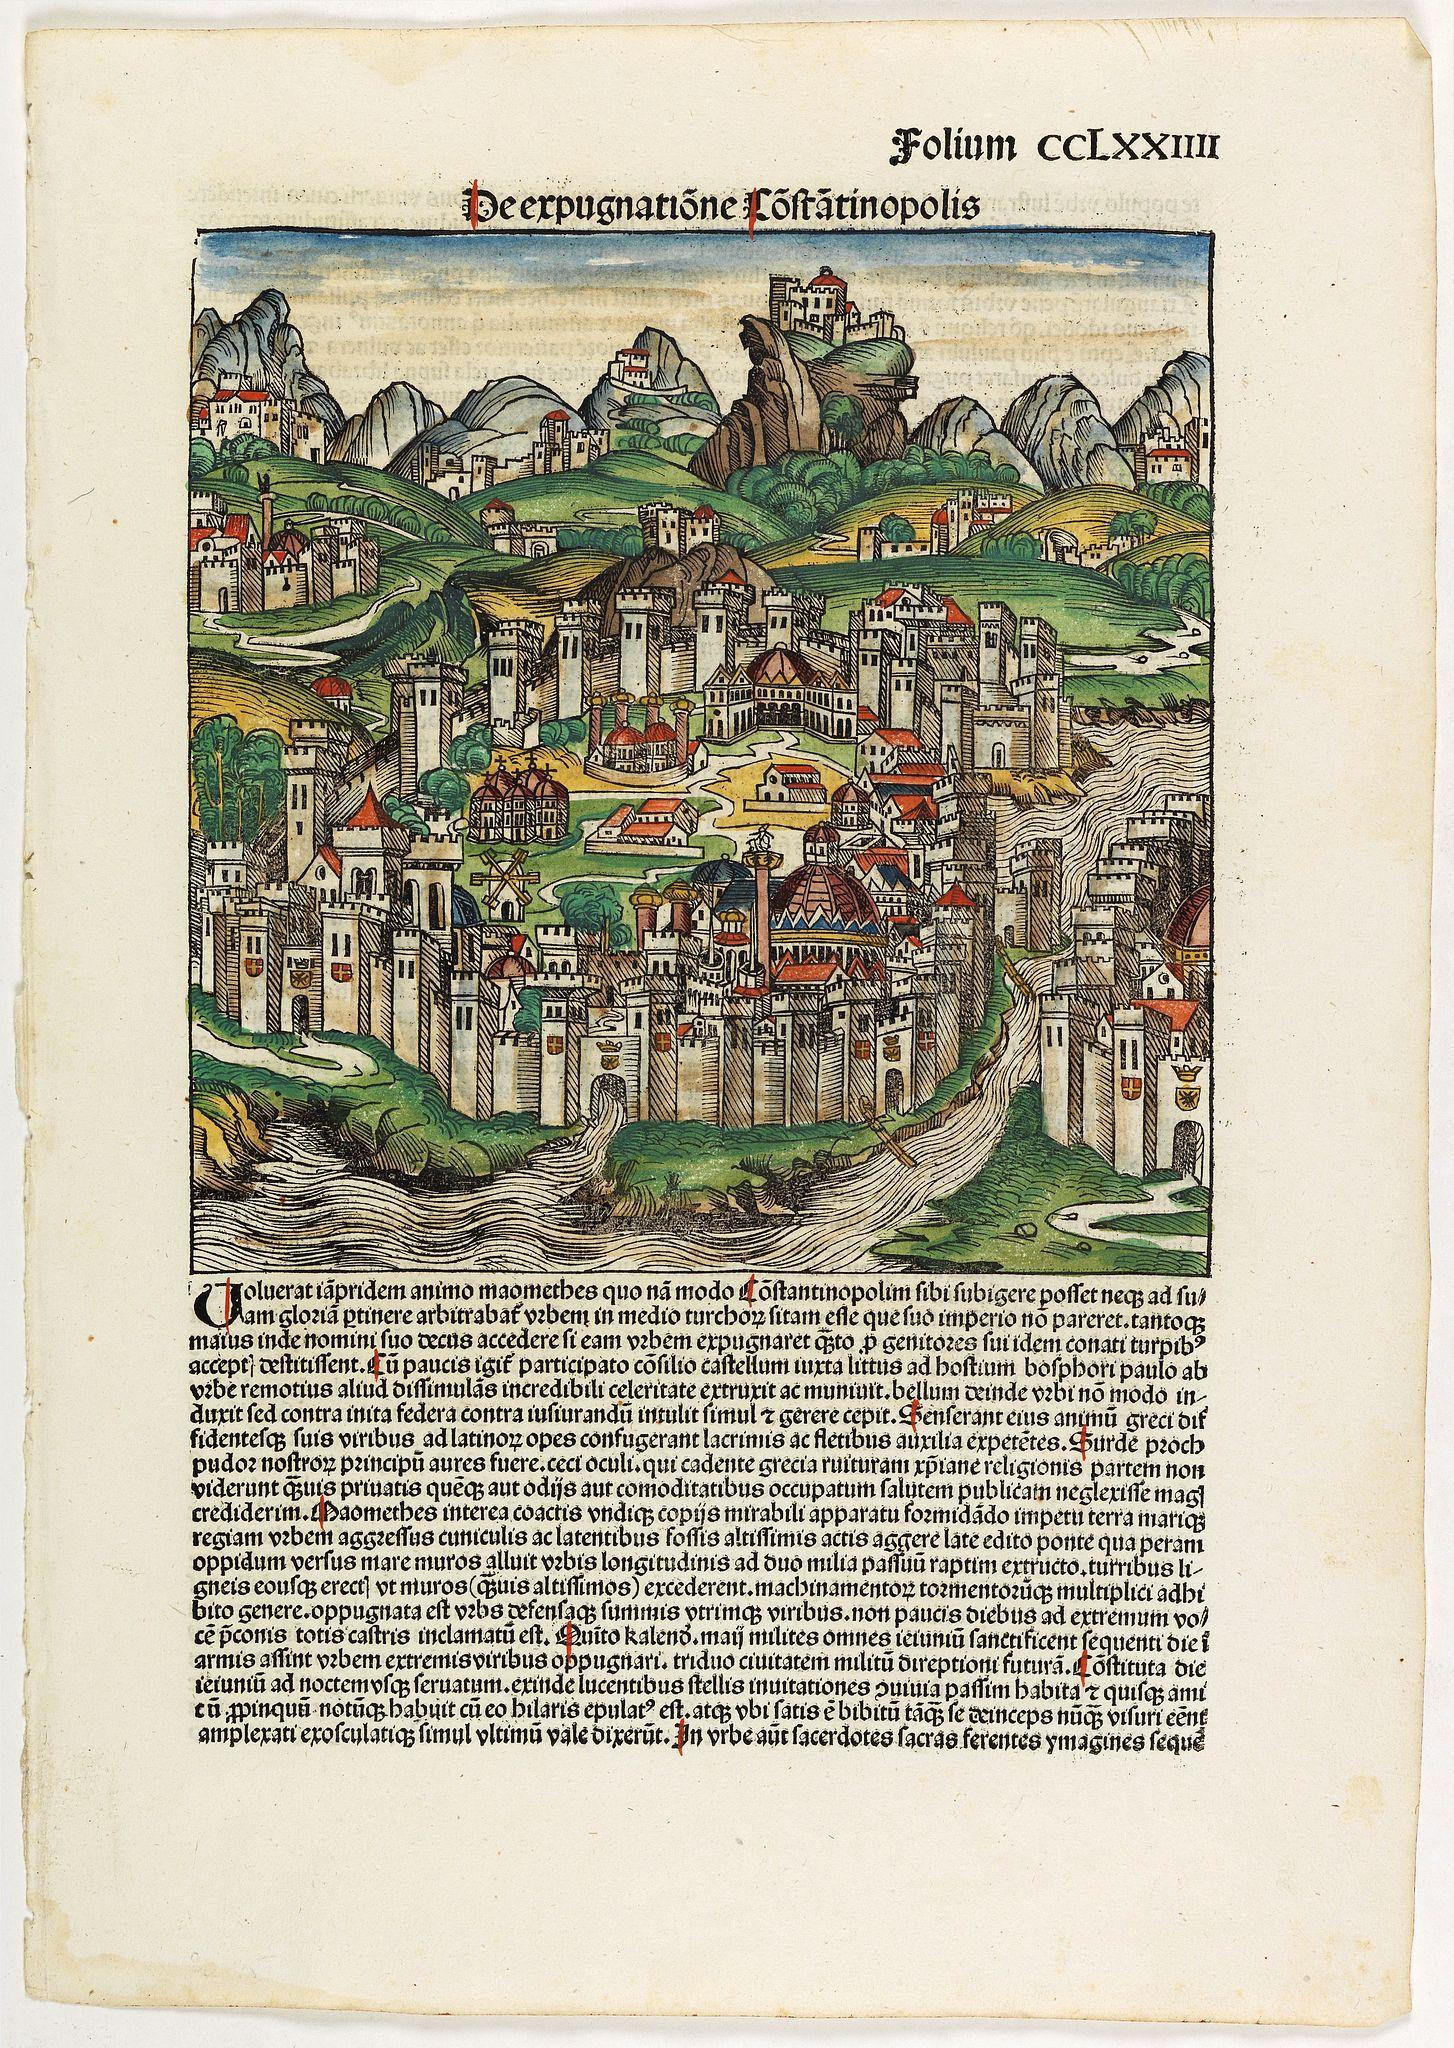 SCHEDEL, H. -  [De expugnatione Constantinopolis. . . Folium CCLXXIIII ].